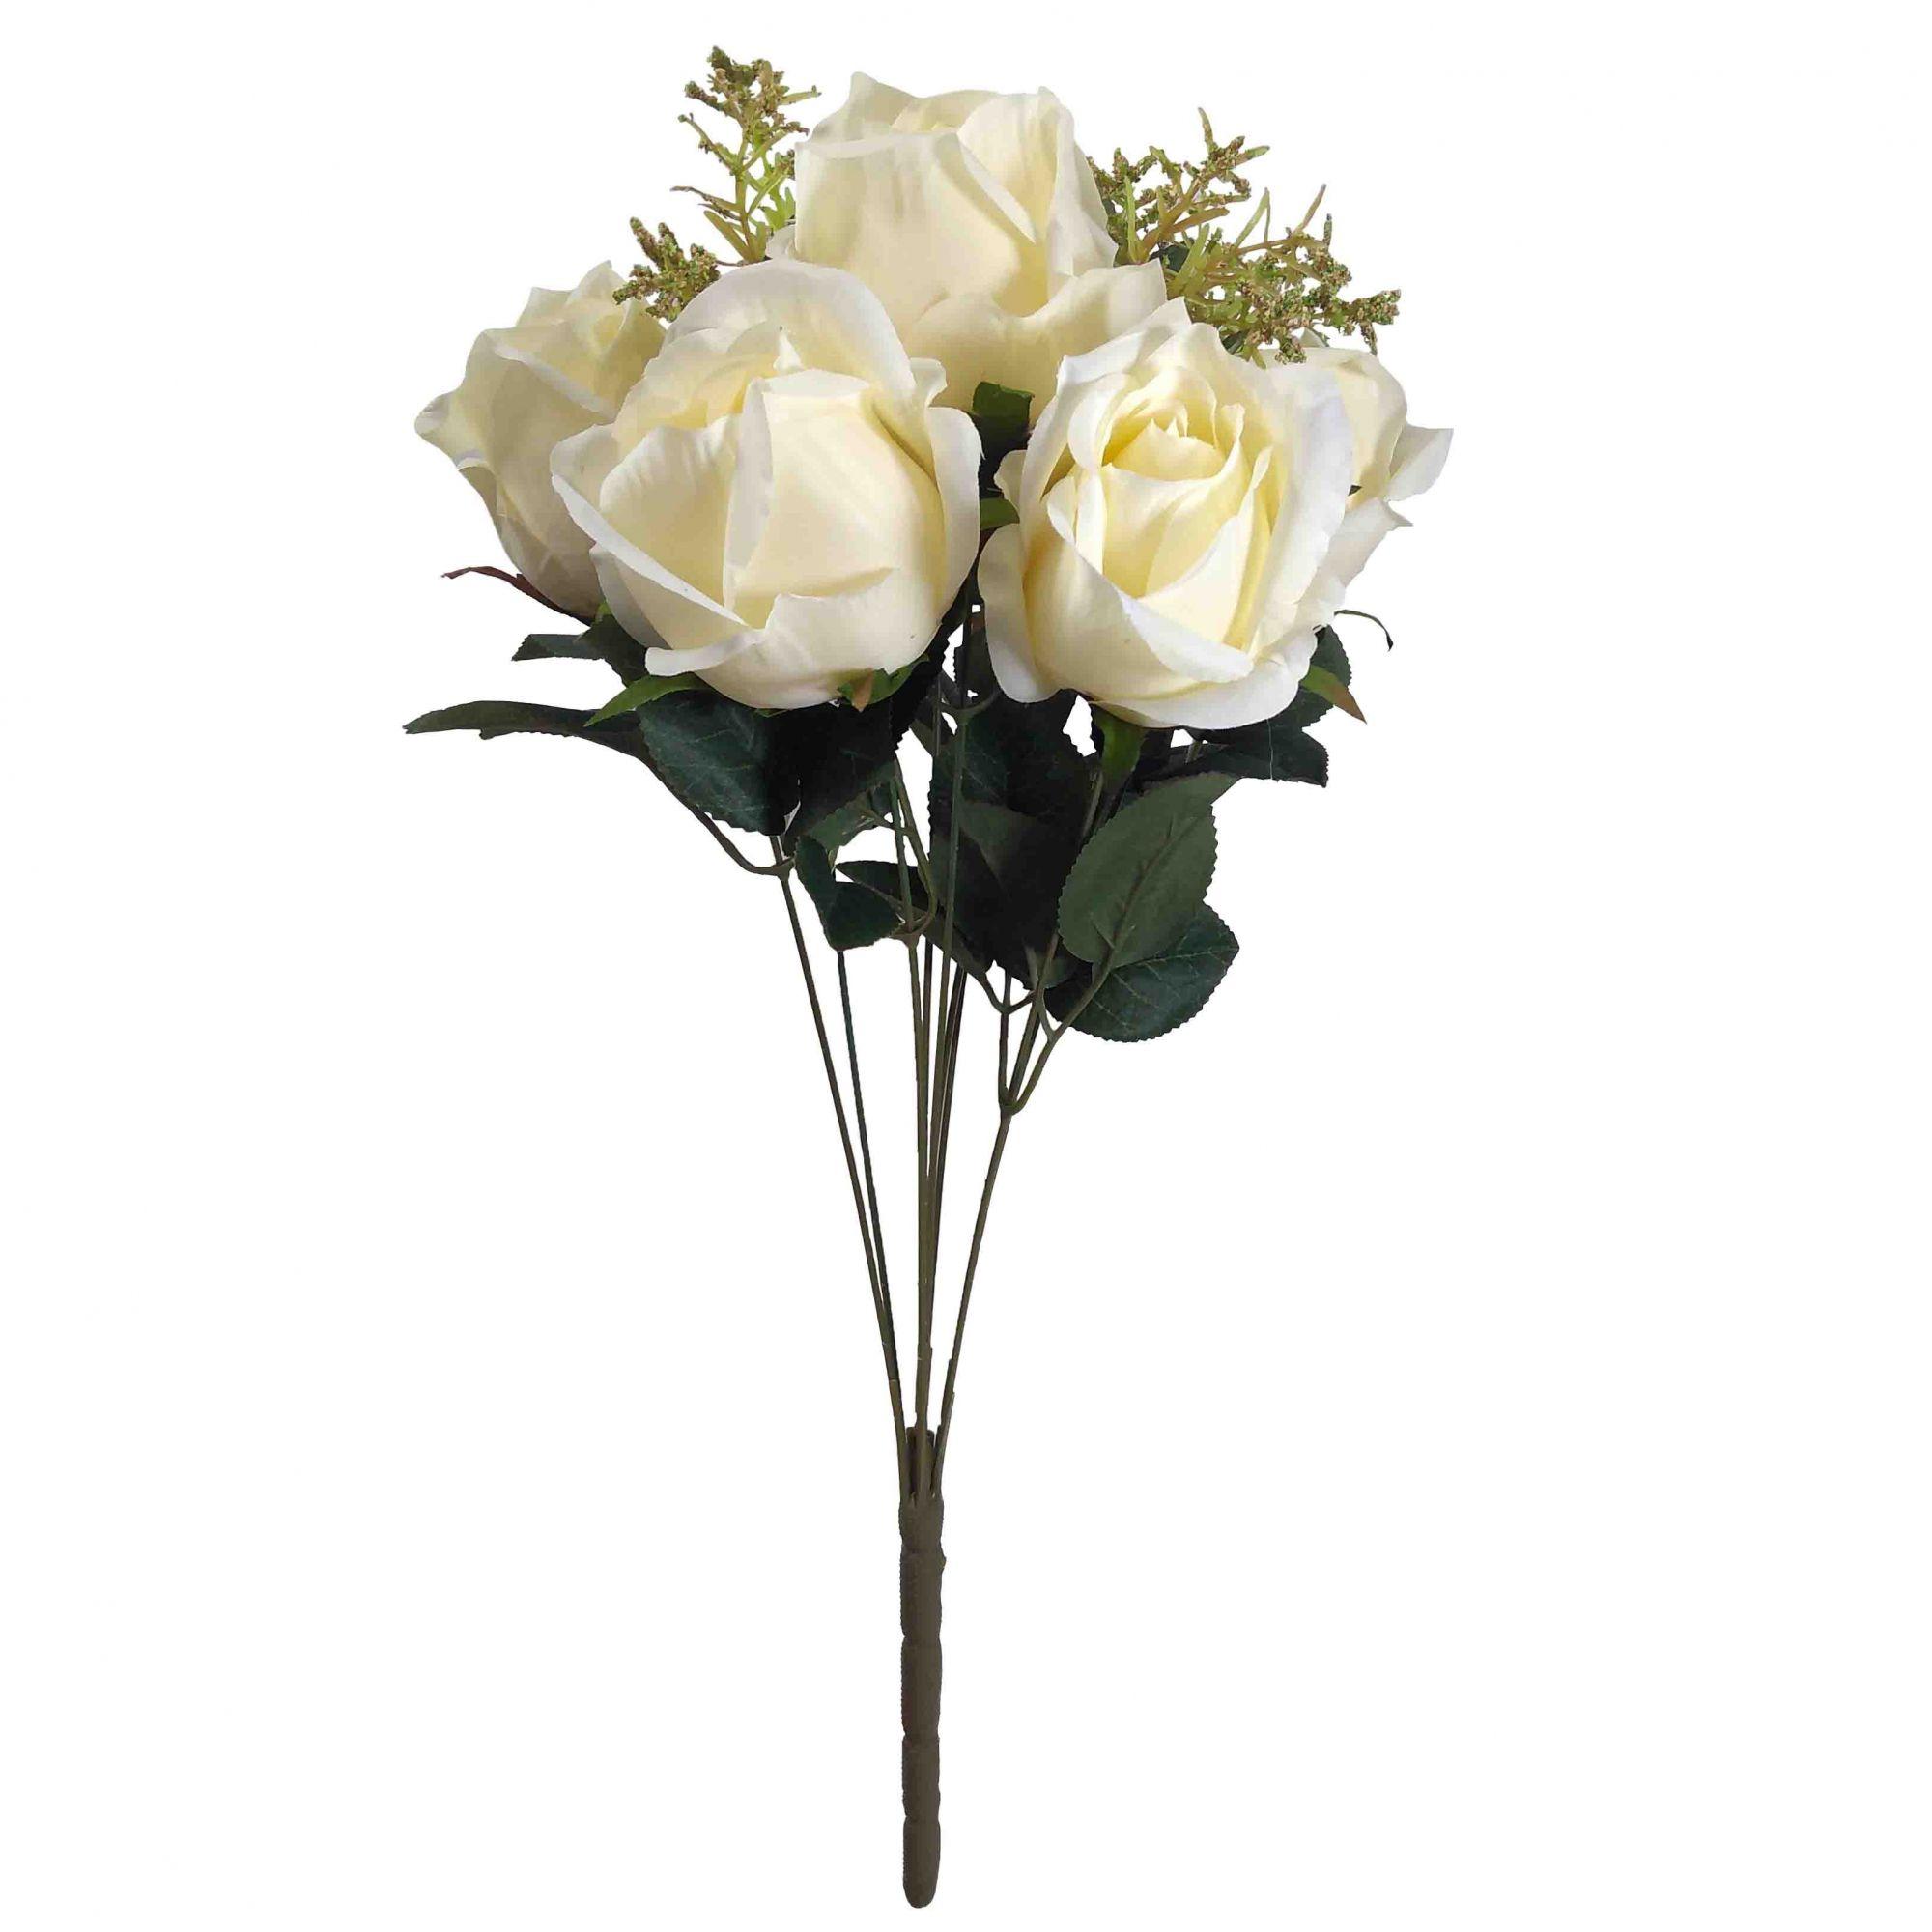 KIt Vaso Vidro Rosa 25CM + Flor Rosa Creme